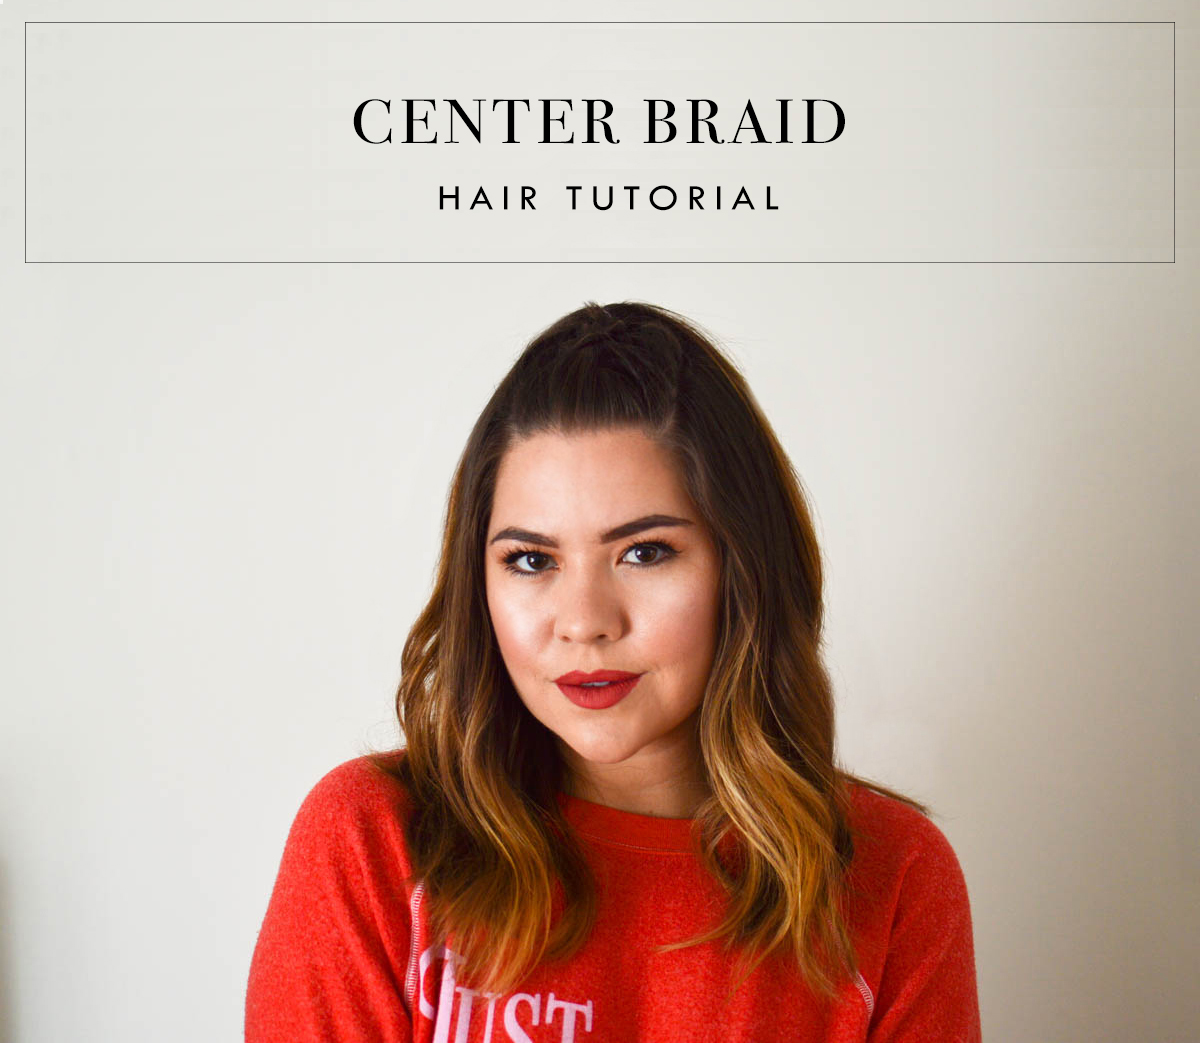 Center Braid Hair Tutorial via. www.birdieshoots.com